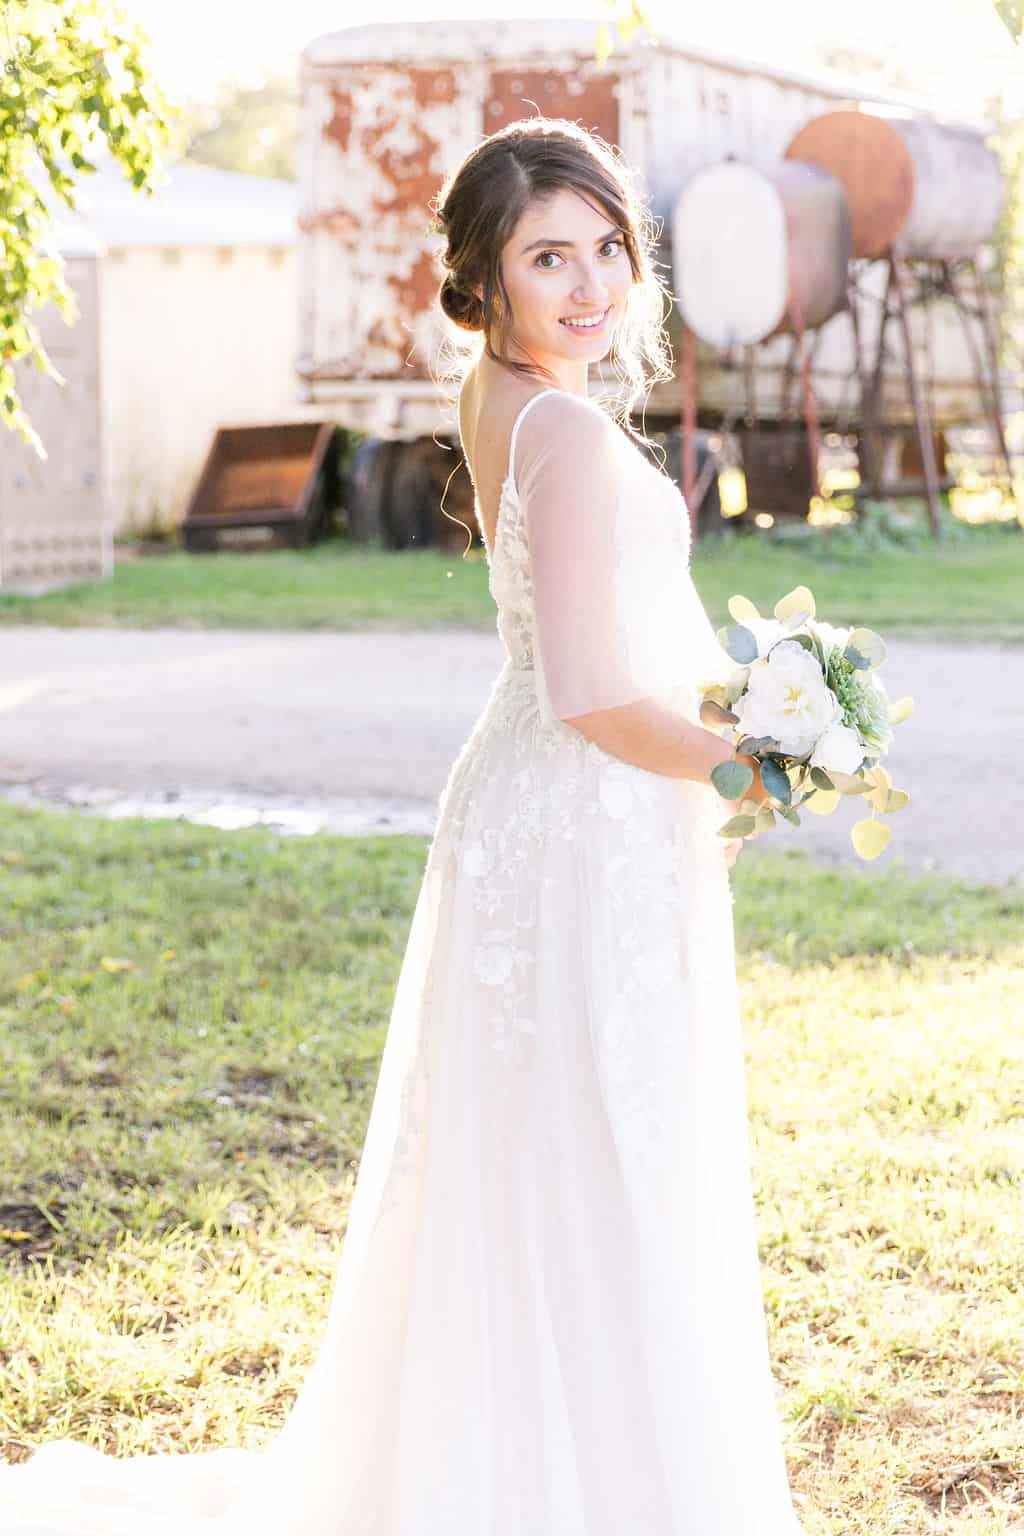 bride-at-barn-style-wedding